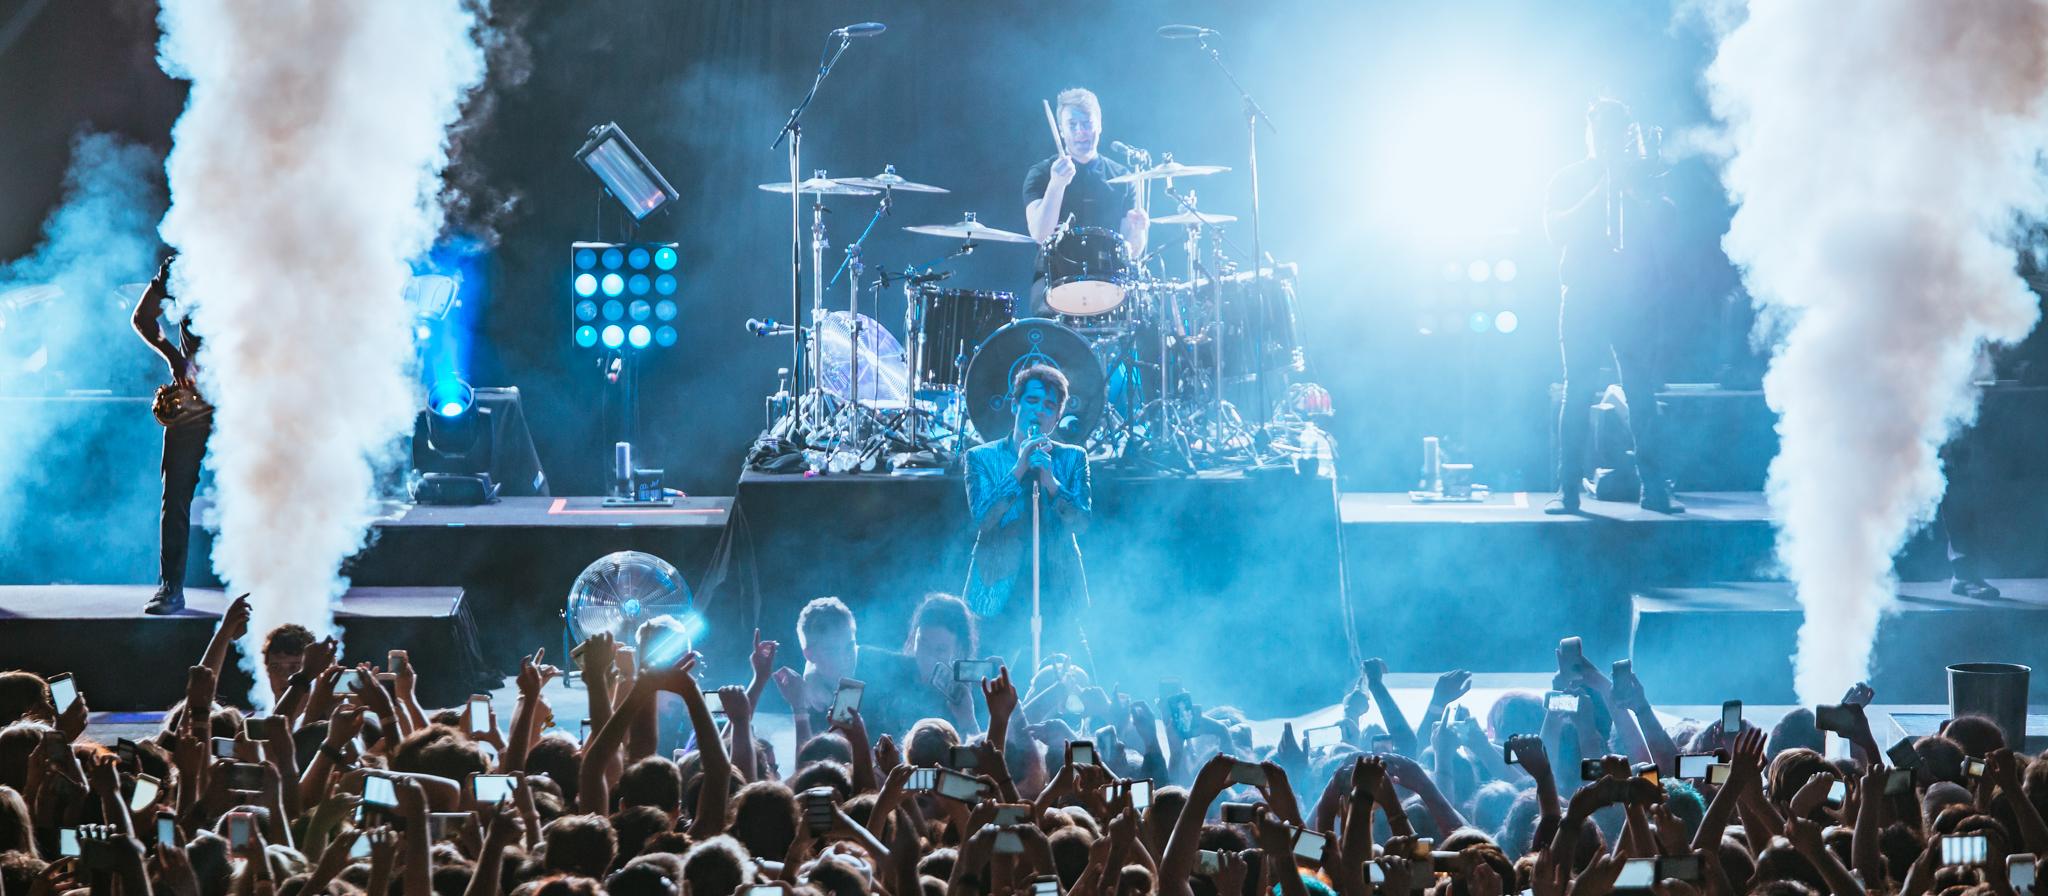 Mitch Lowe Photo - Panic At The Disco - Riverstage-59.jpg